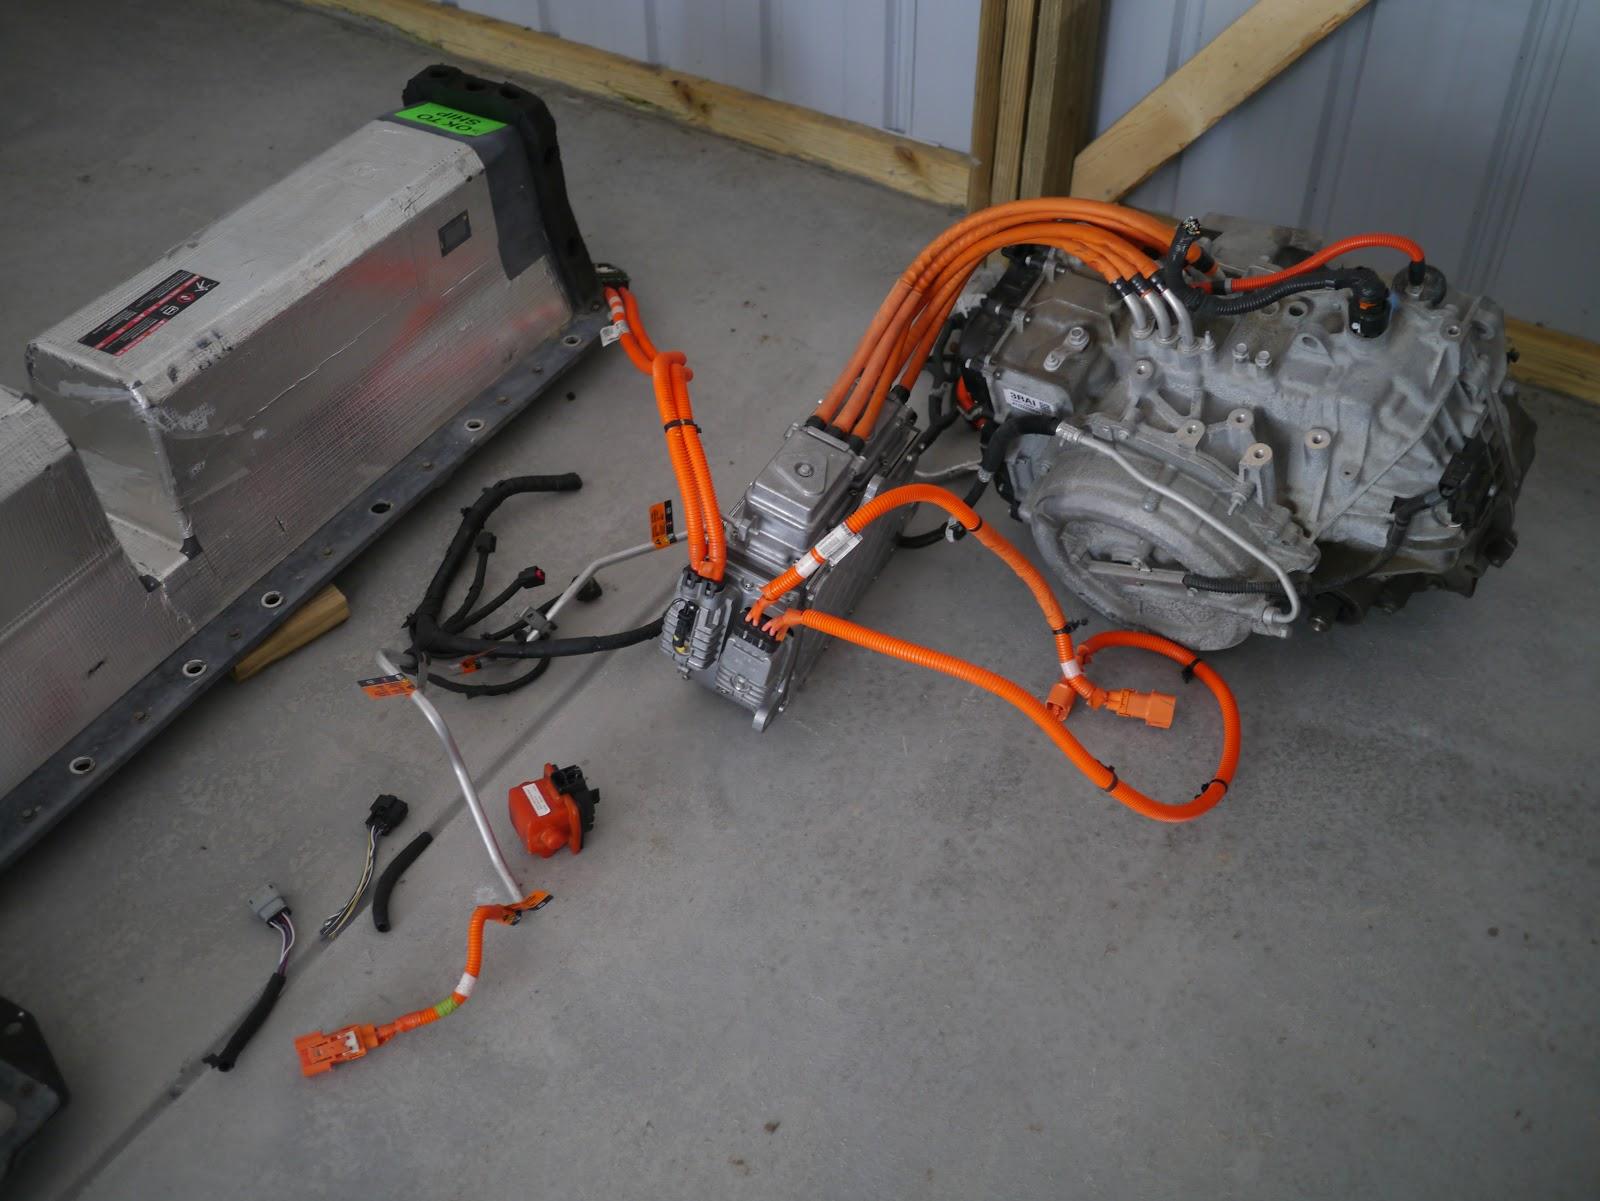 300w inverter wiring diagram experimental vehicle engineering chevy volt drivetrain #13